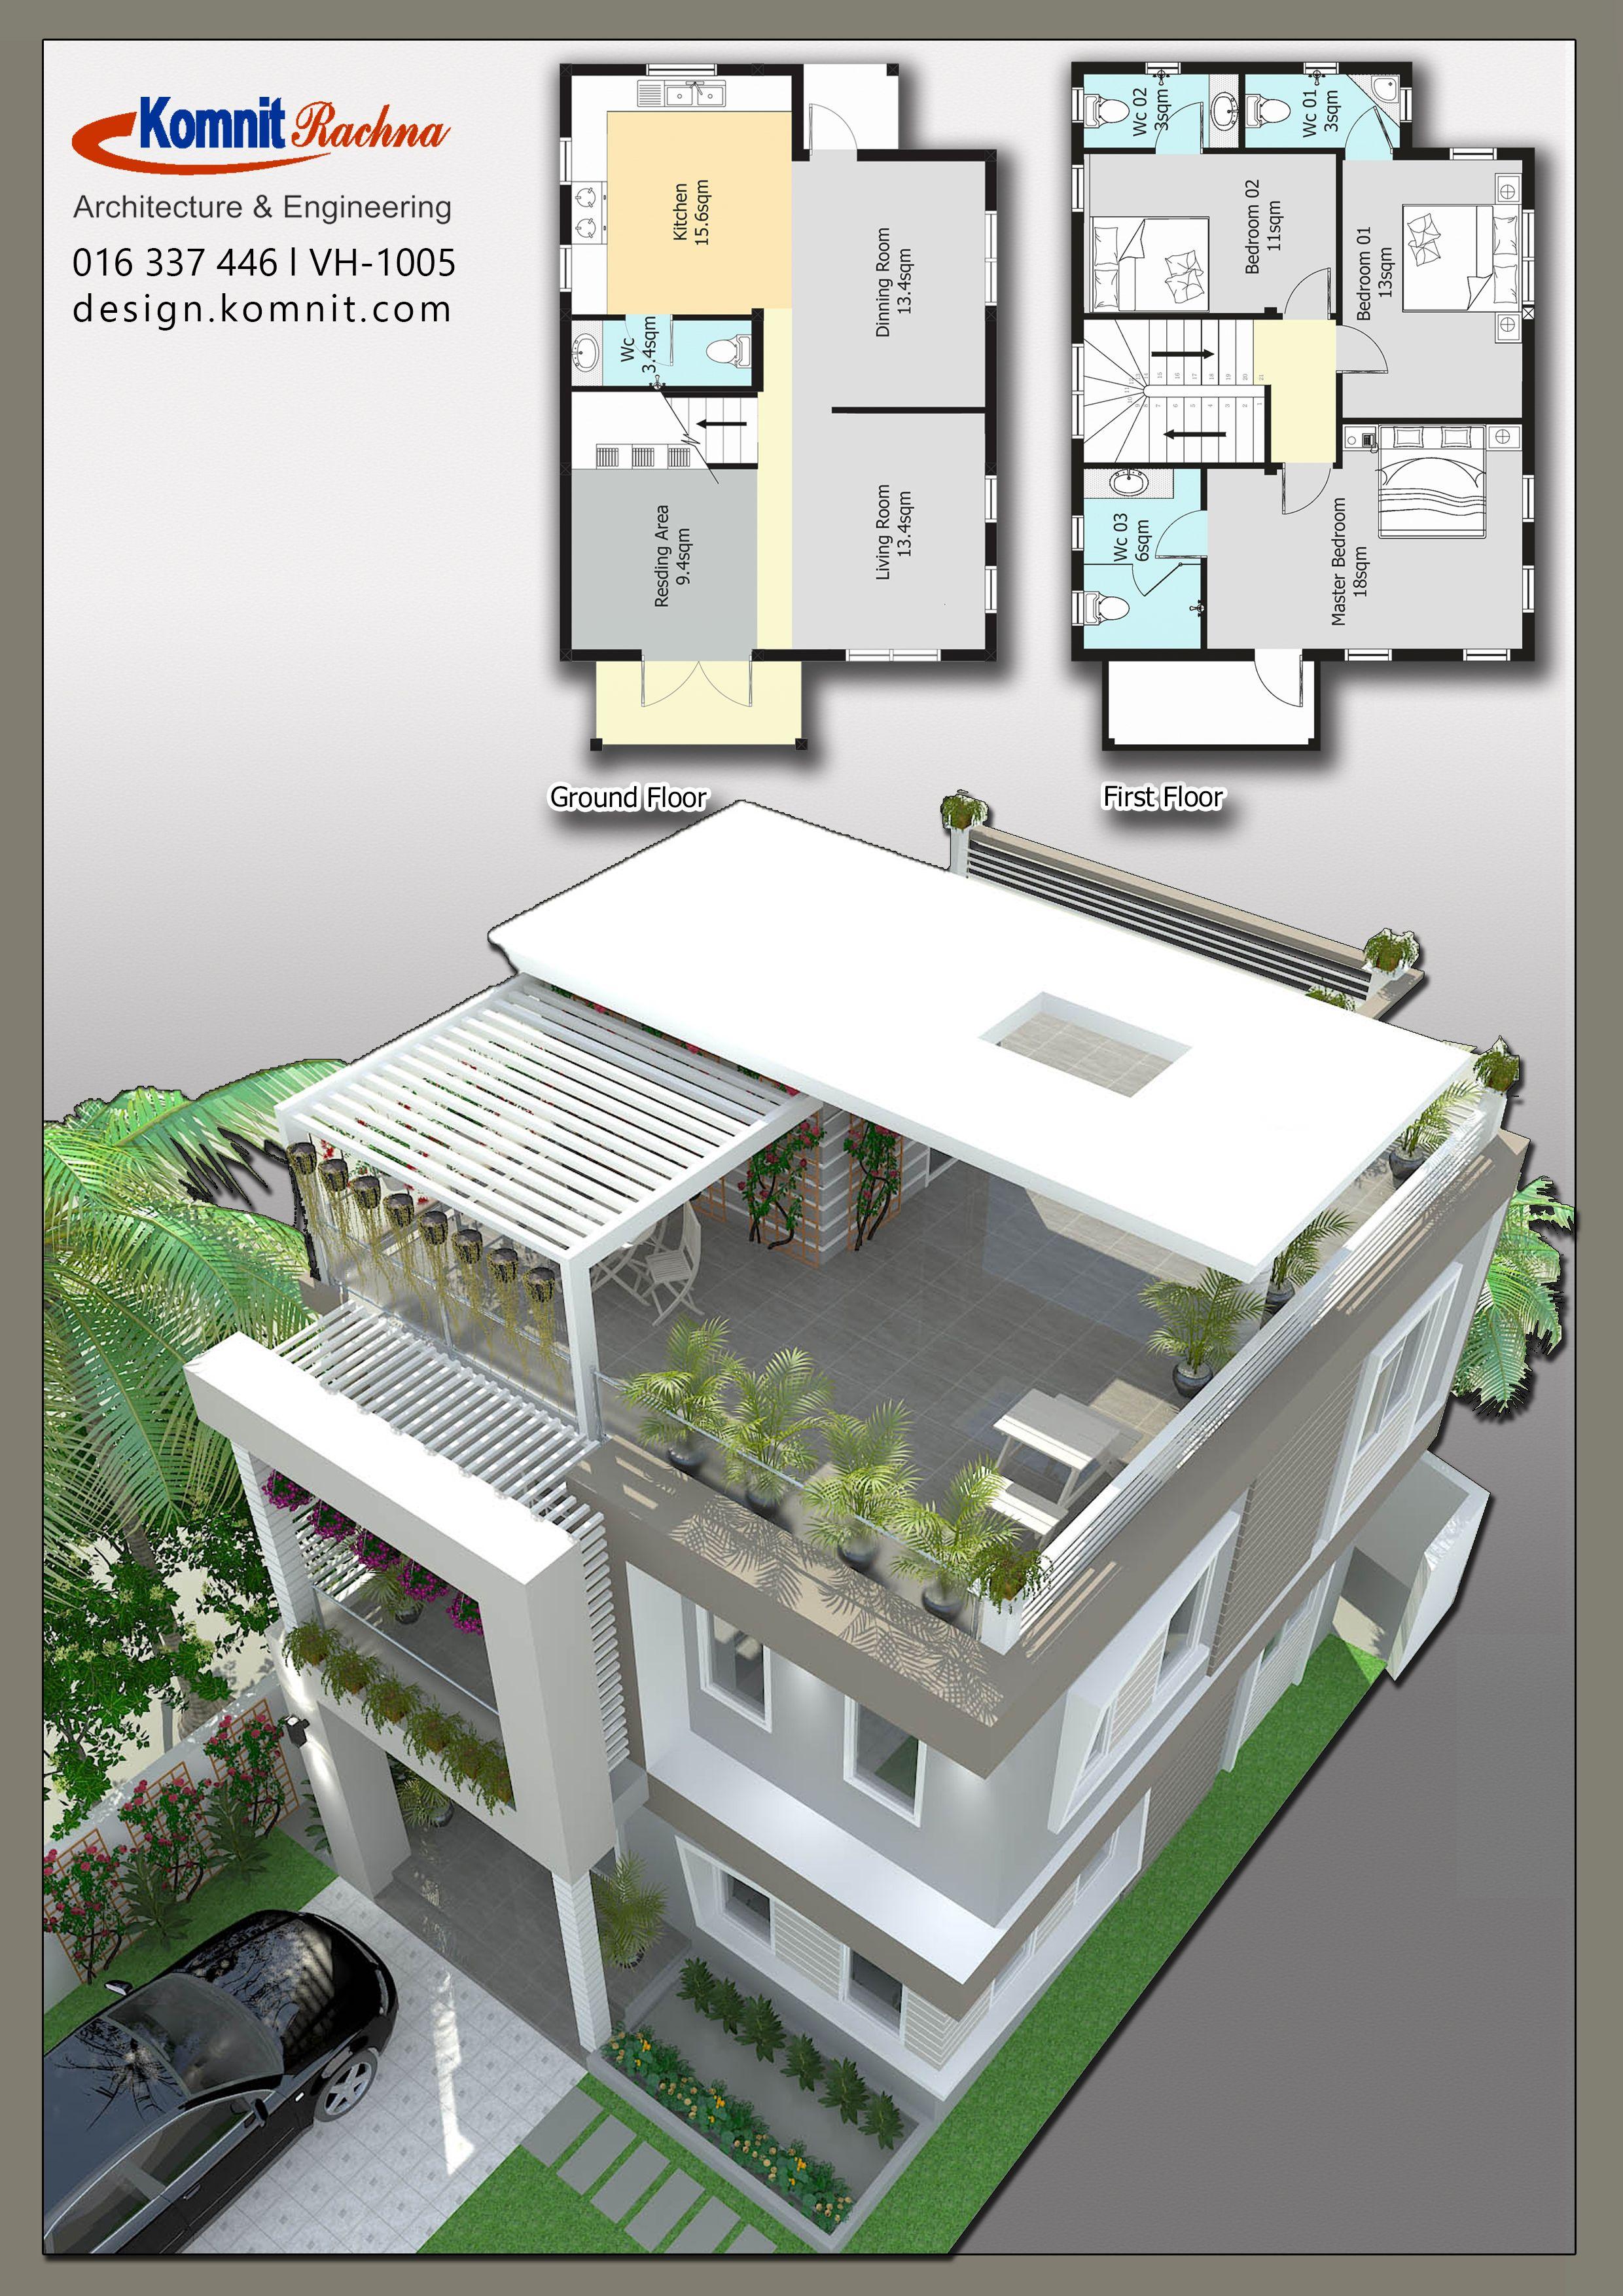 Houe Ep9 Vh 1005 Villas Komnit Khmer In Phnom Penh Cambodia House Designs Exterior House Layout Plans House Plans